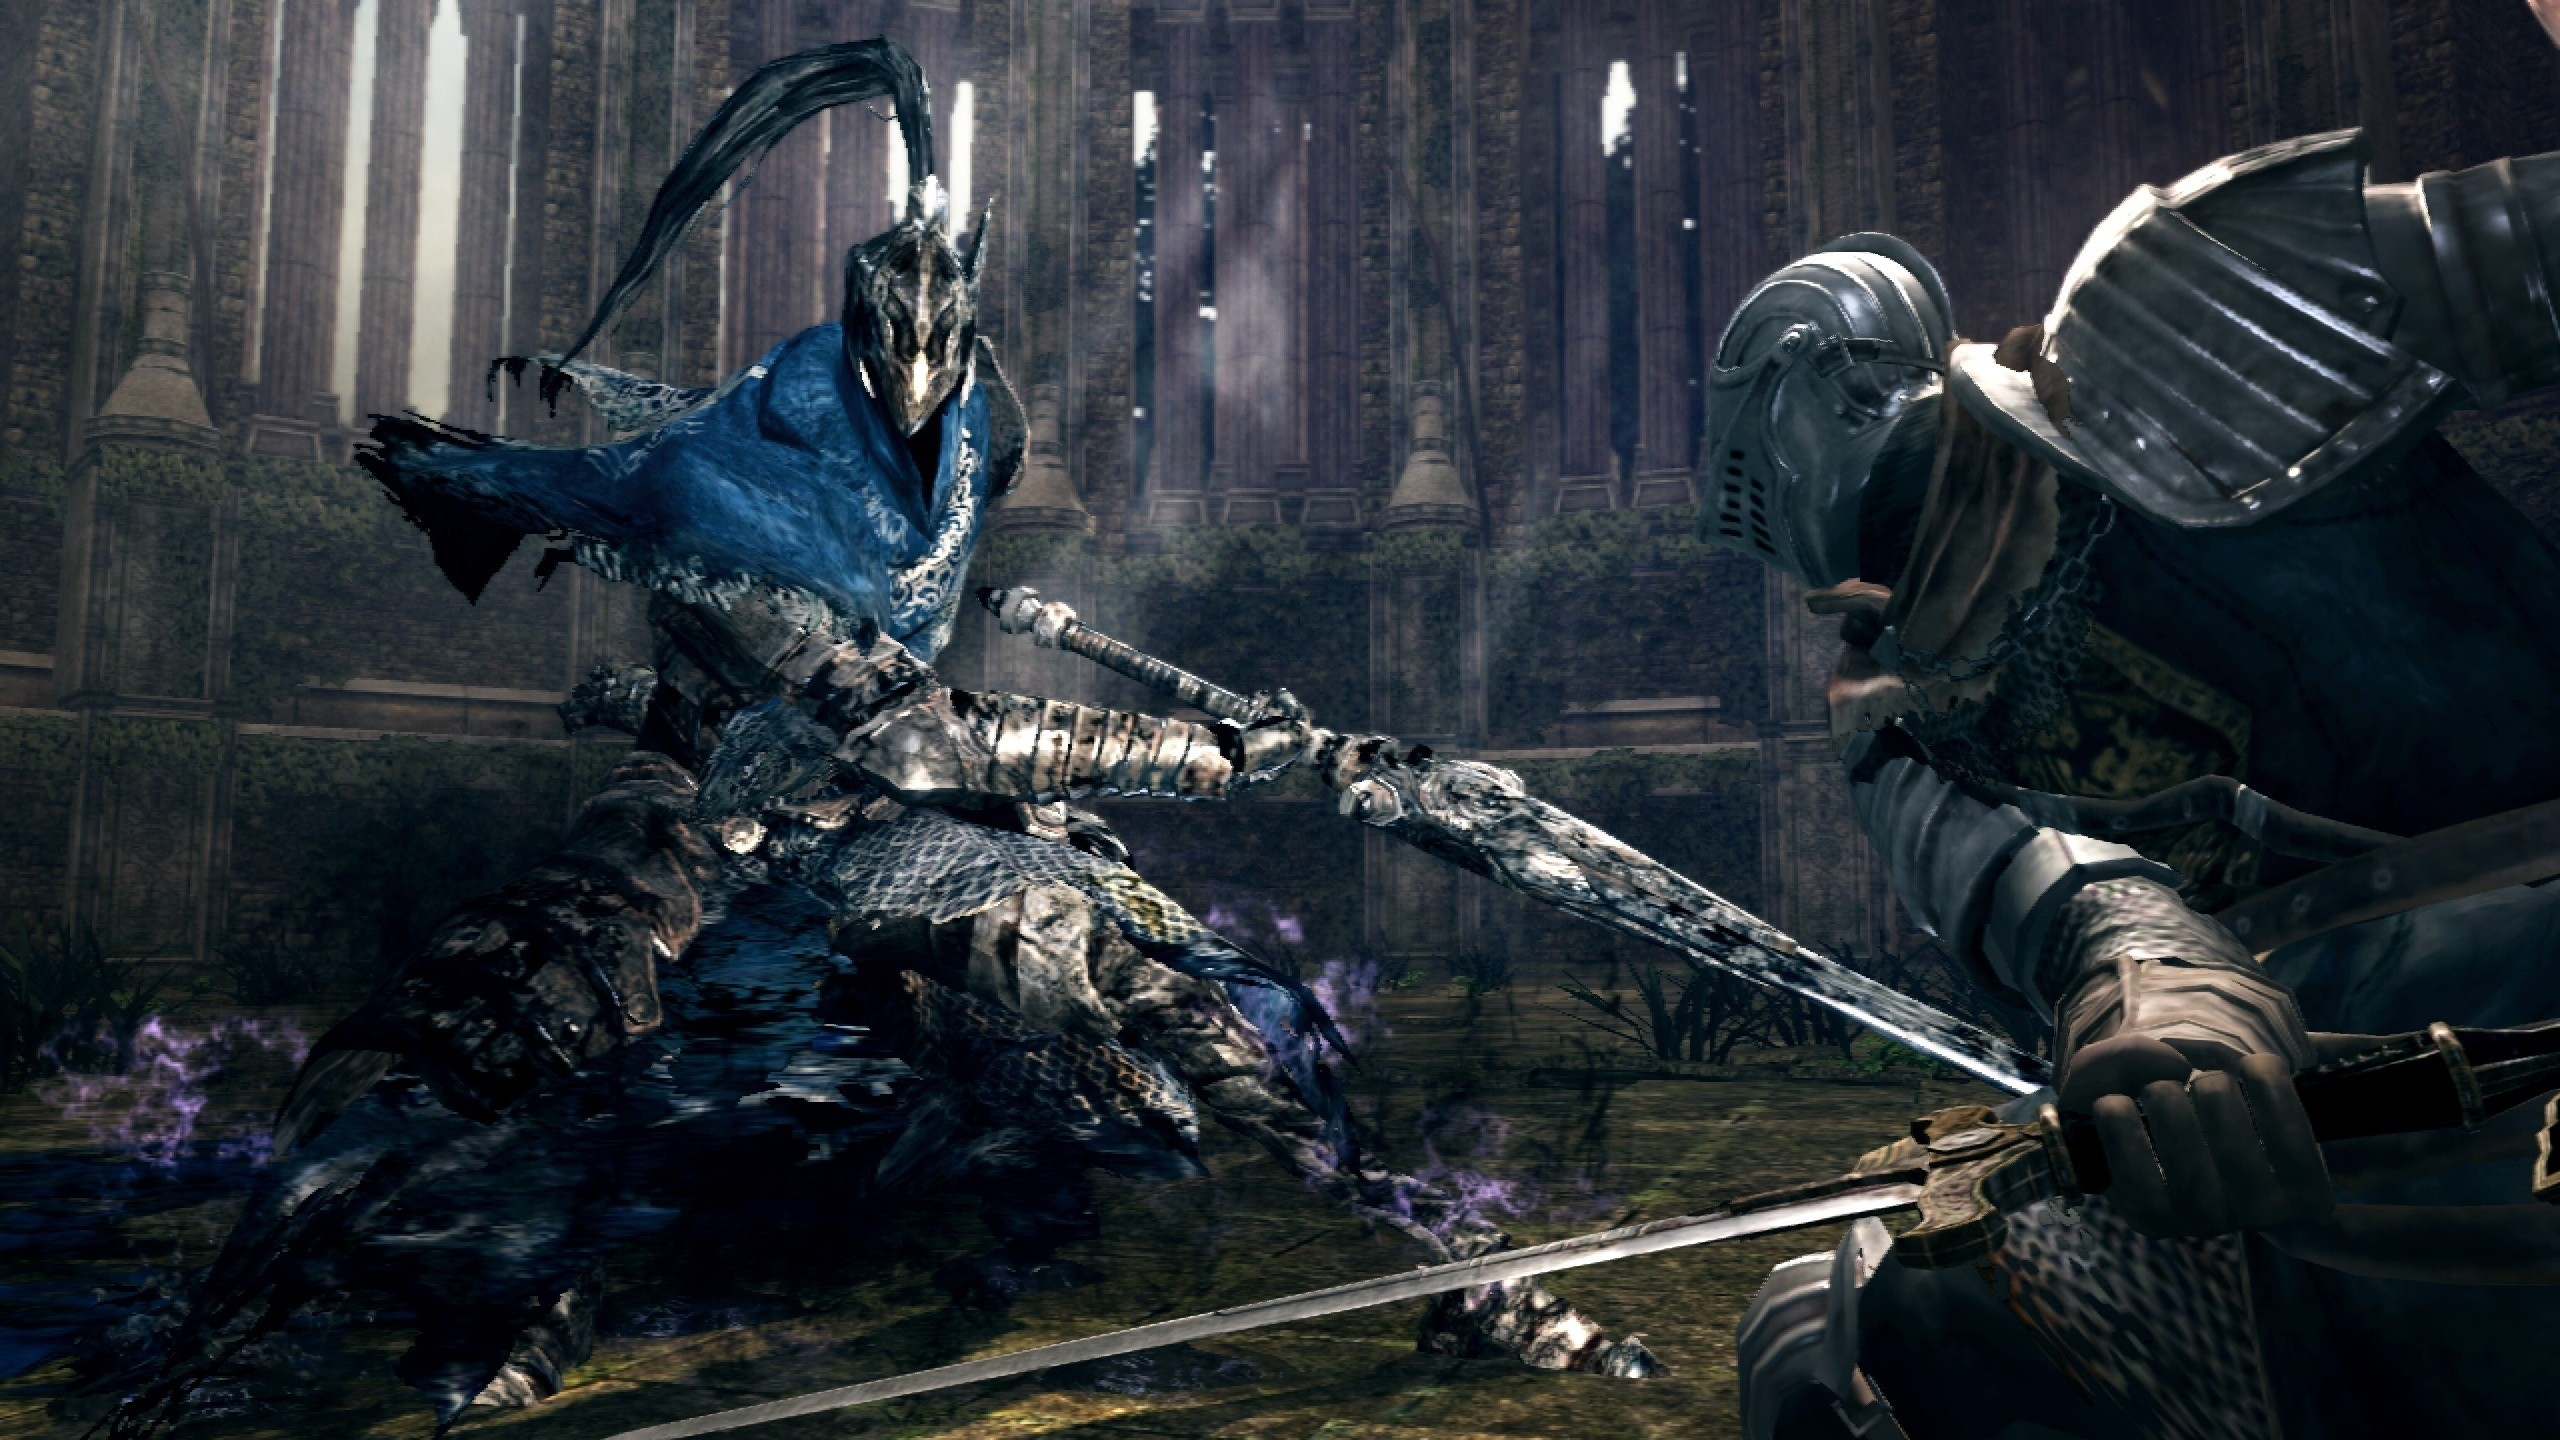 General 2560x1440 Dark Souls Artorias abyss video games